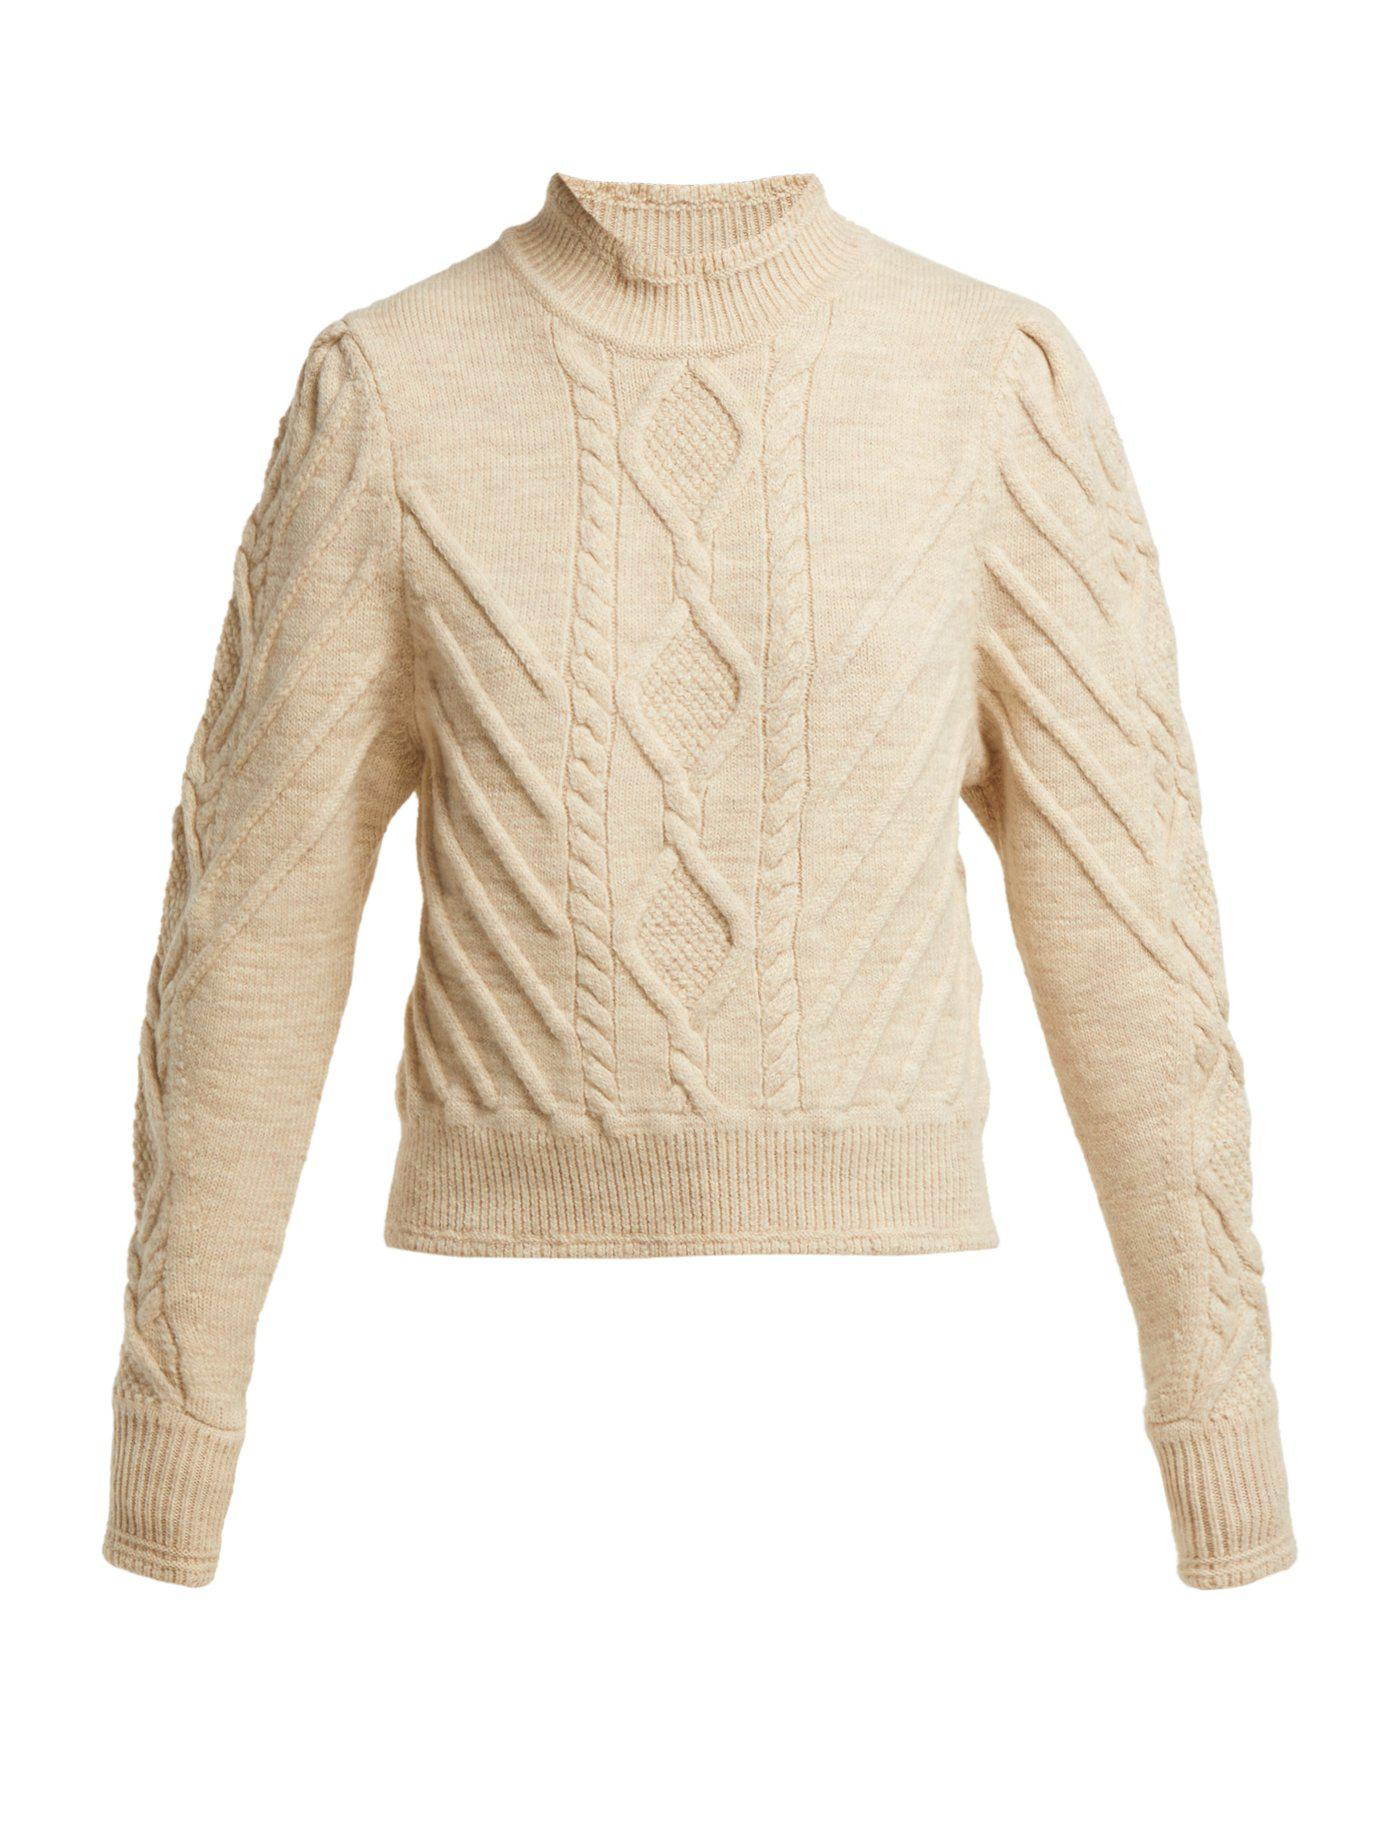 cb3d4d23f0288b Lyst - Isabel Marant Brantley Aran Knit Wool Blend Sweater in White